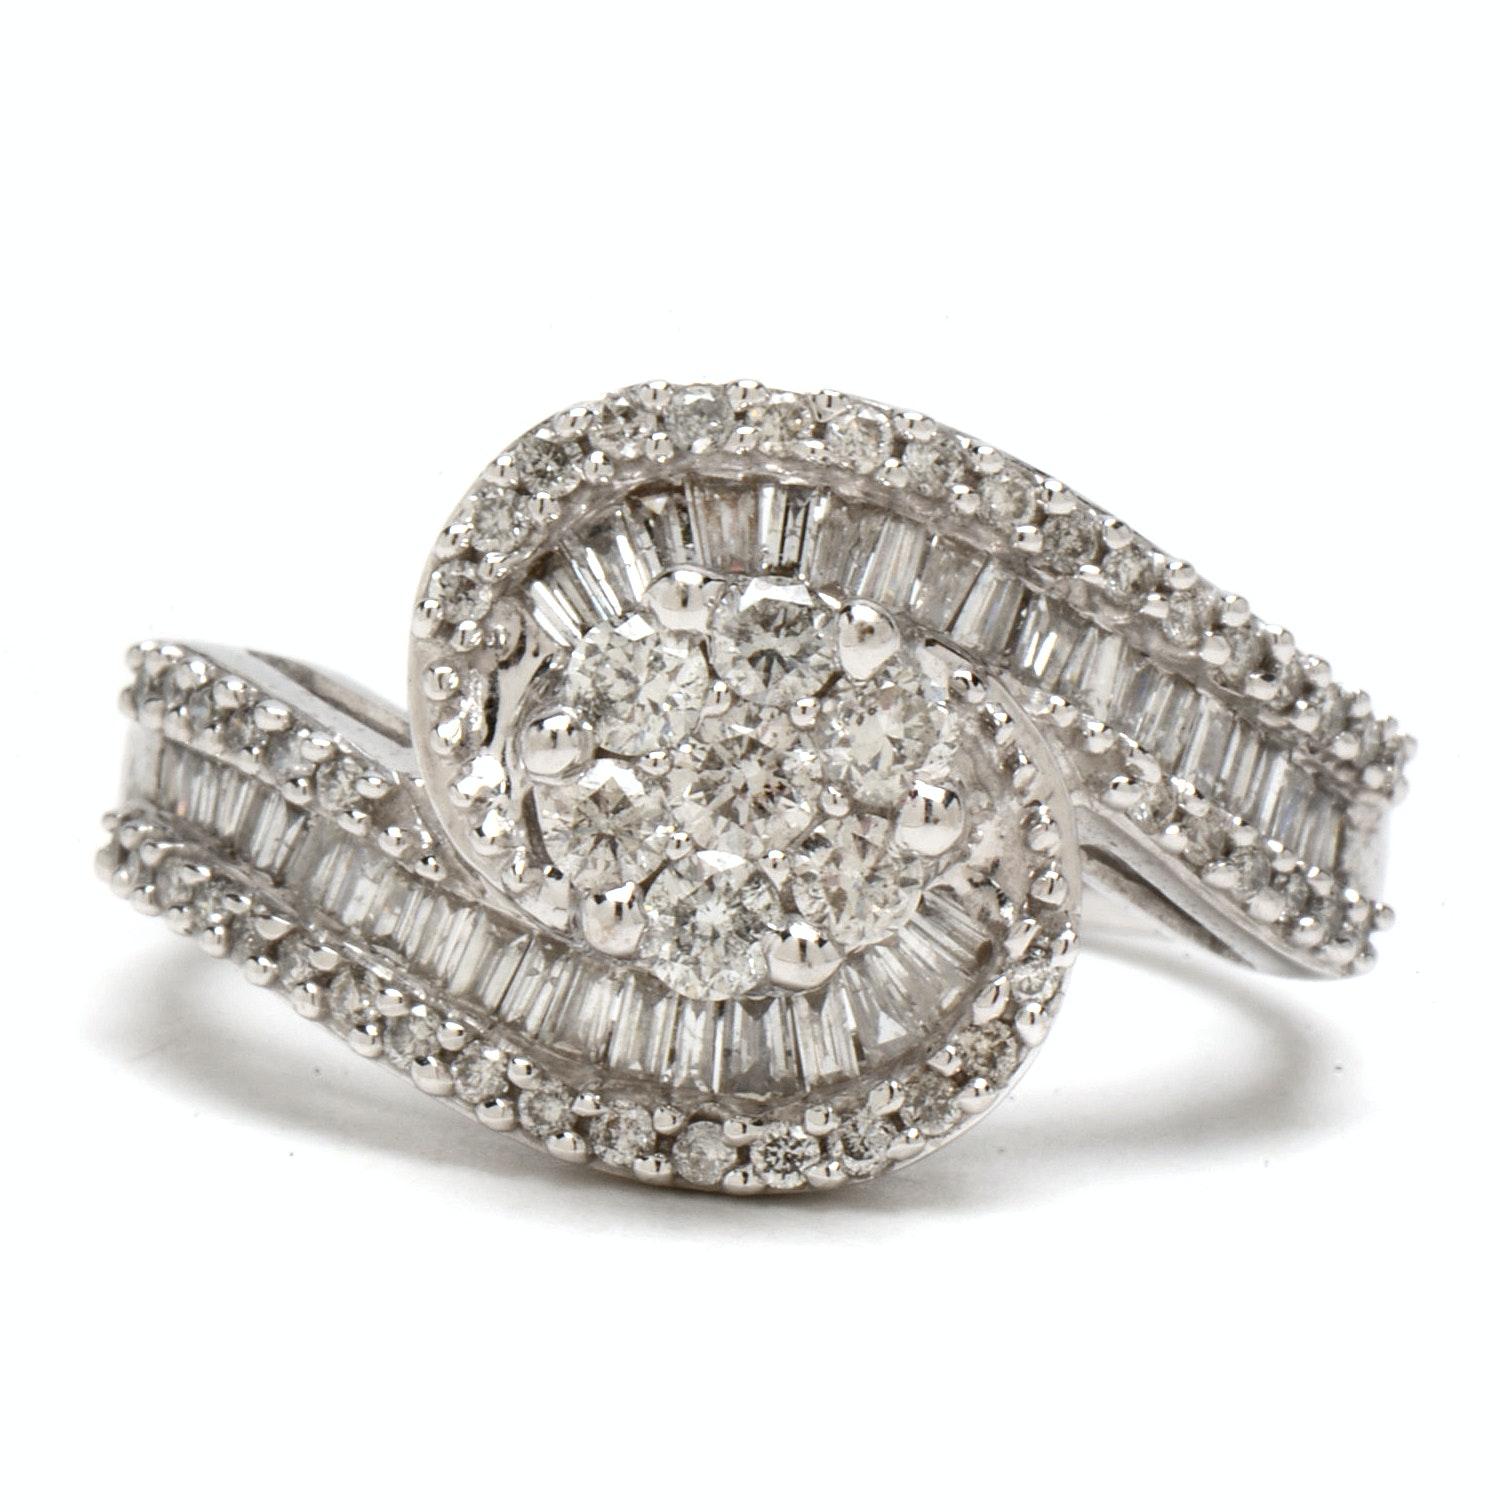 14K White Gold Diamond Swirl Cluster Statement Ring